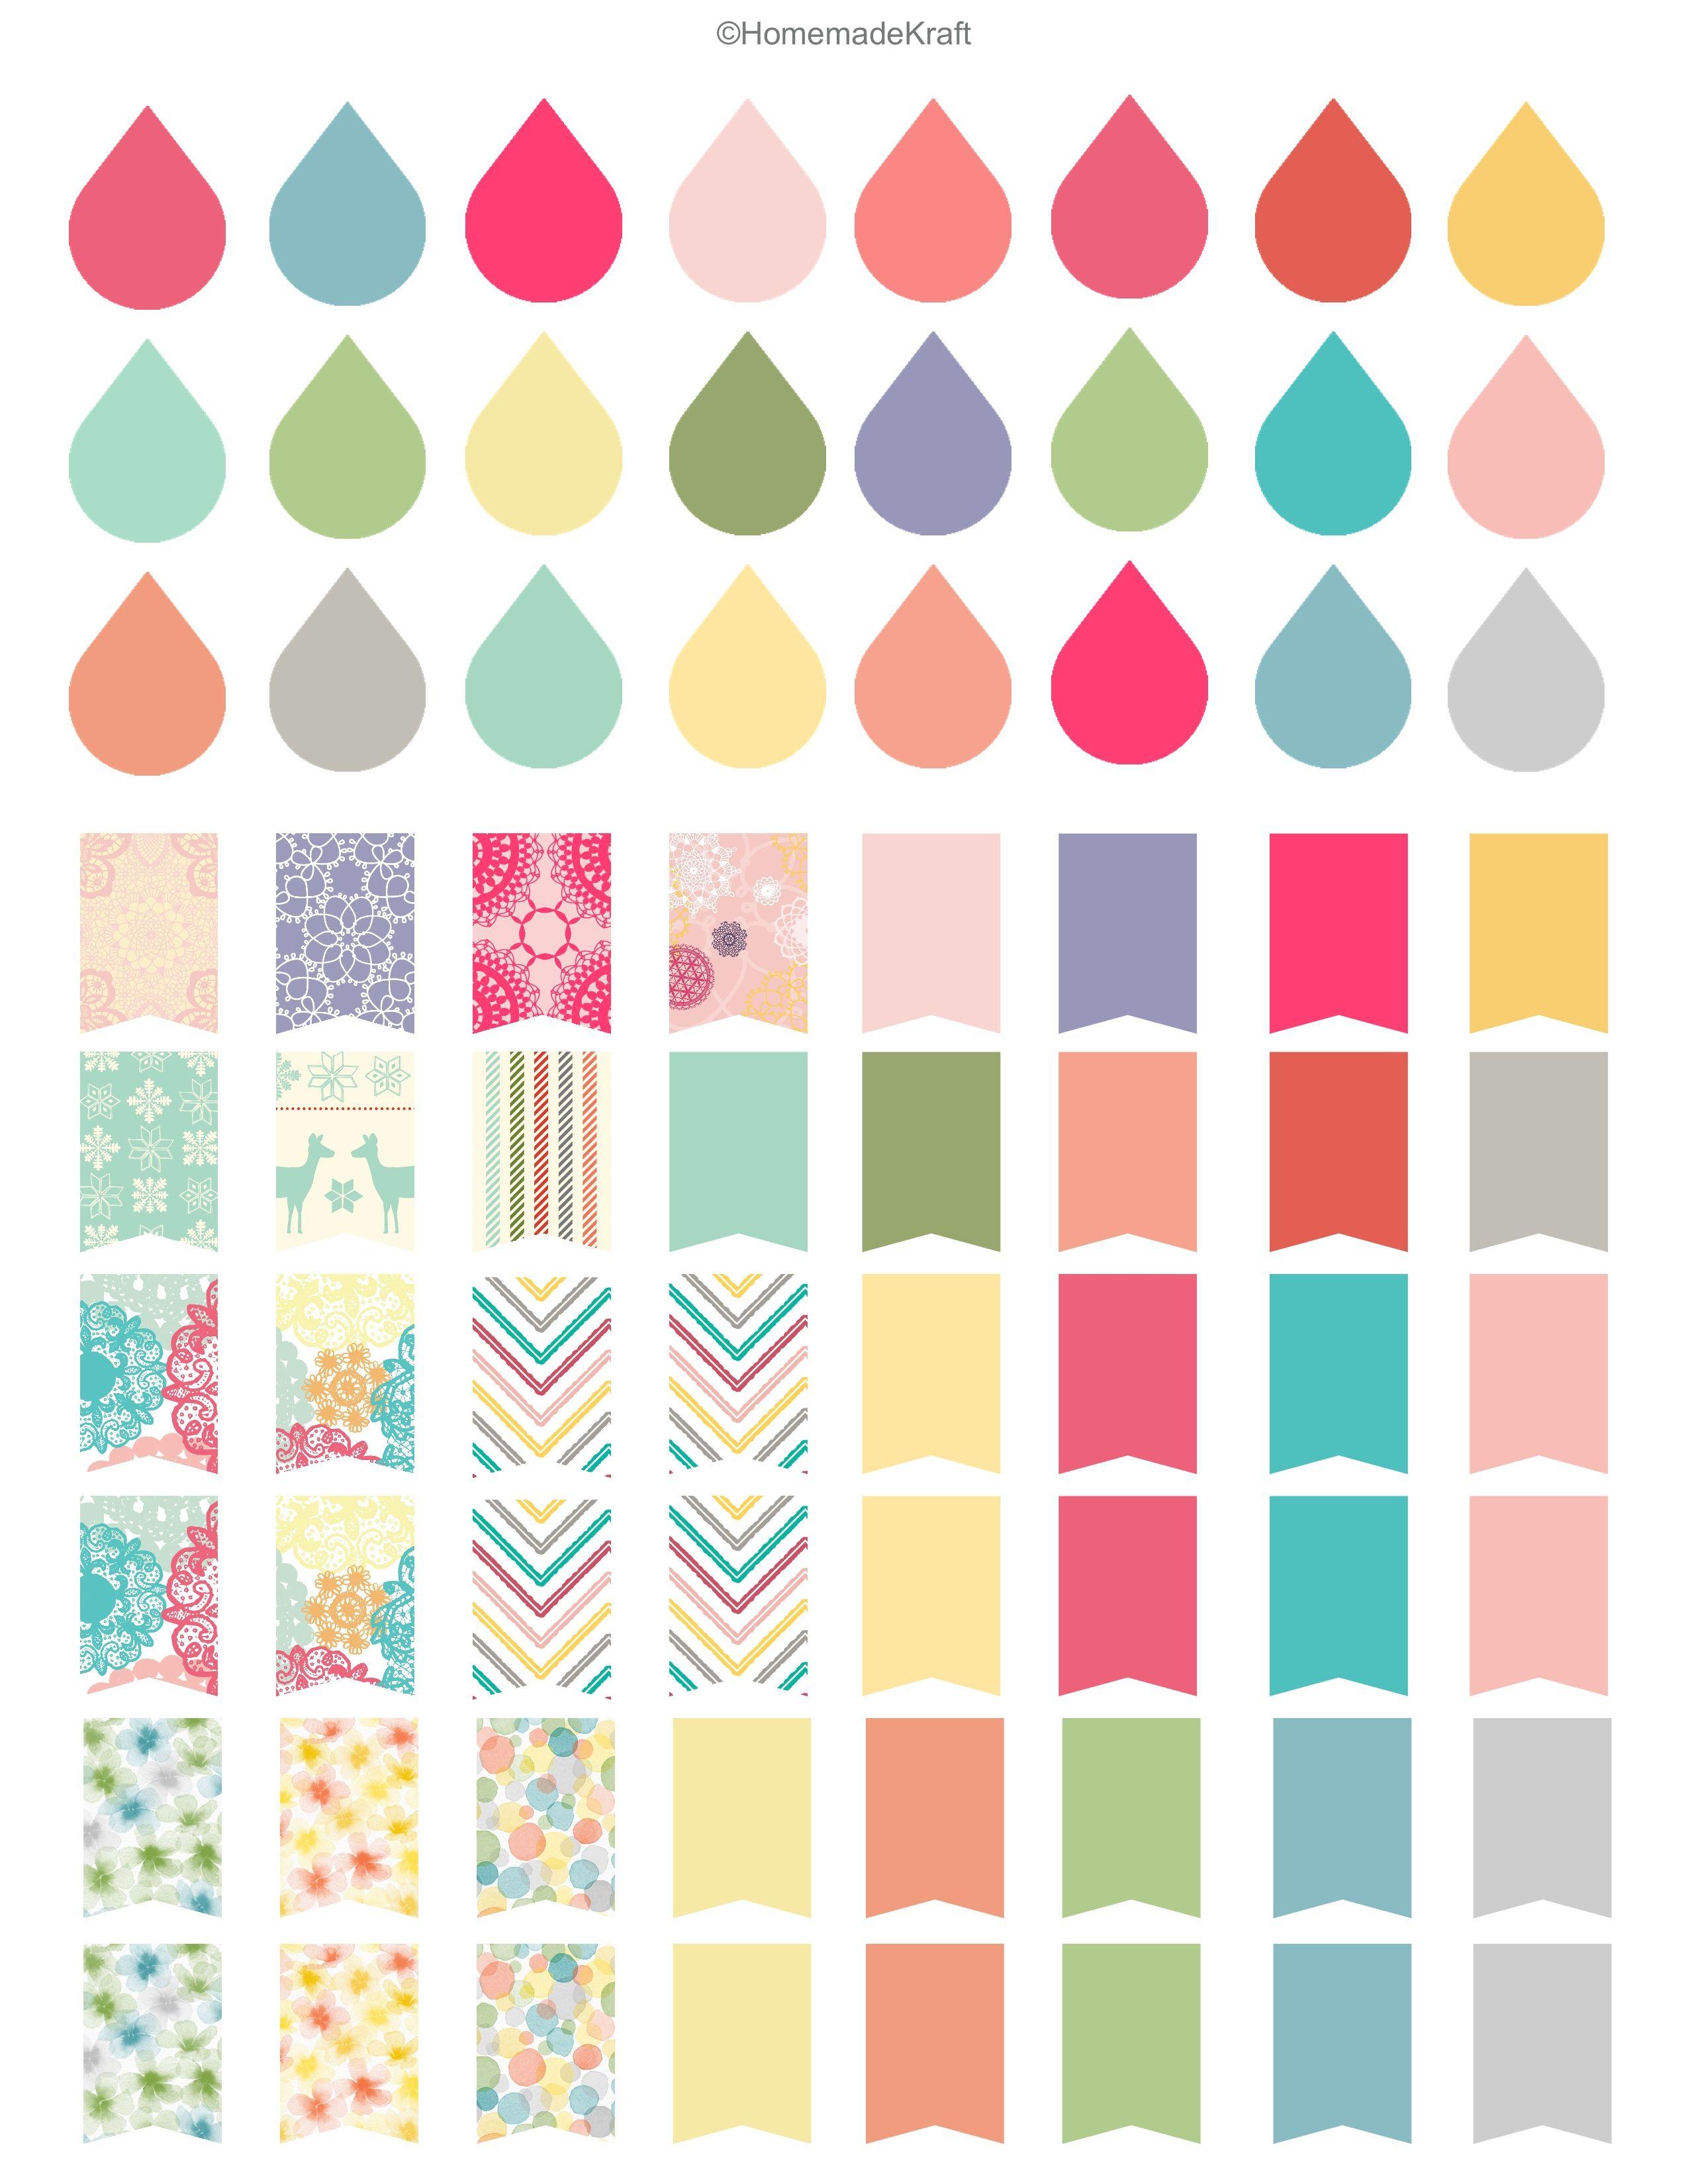 Free Sticker Printable! | Free printable stickers, Printable ...